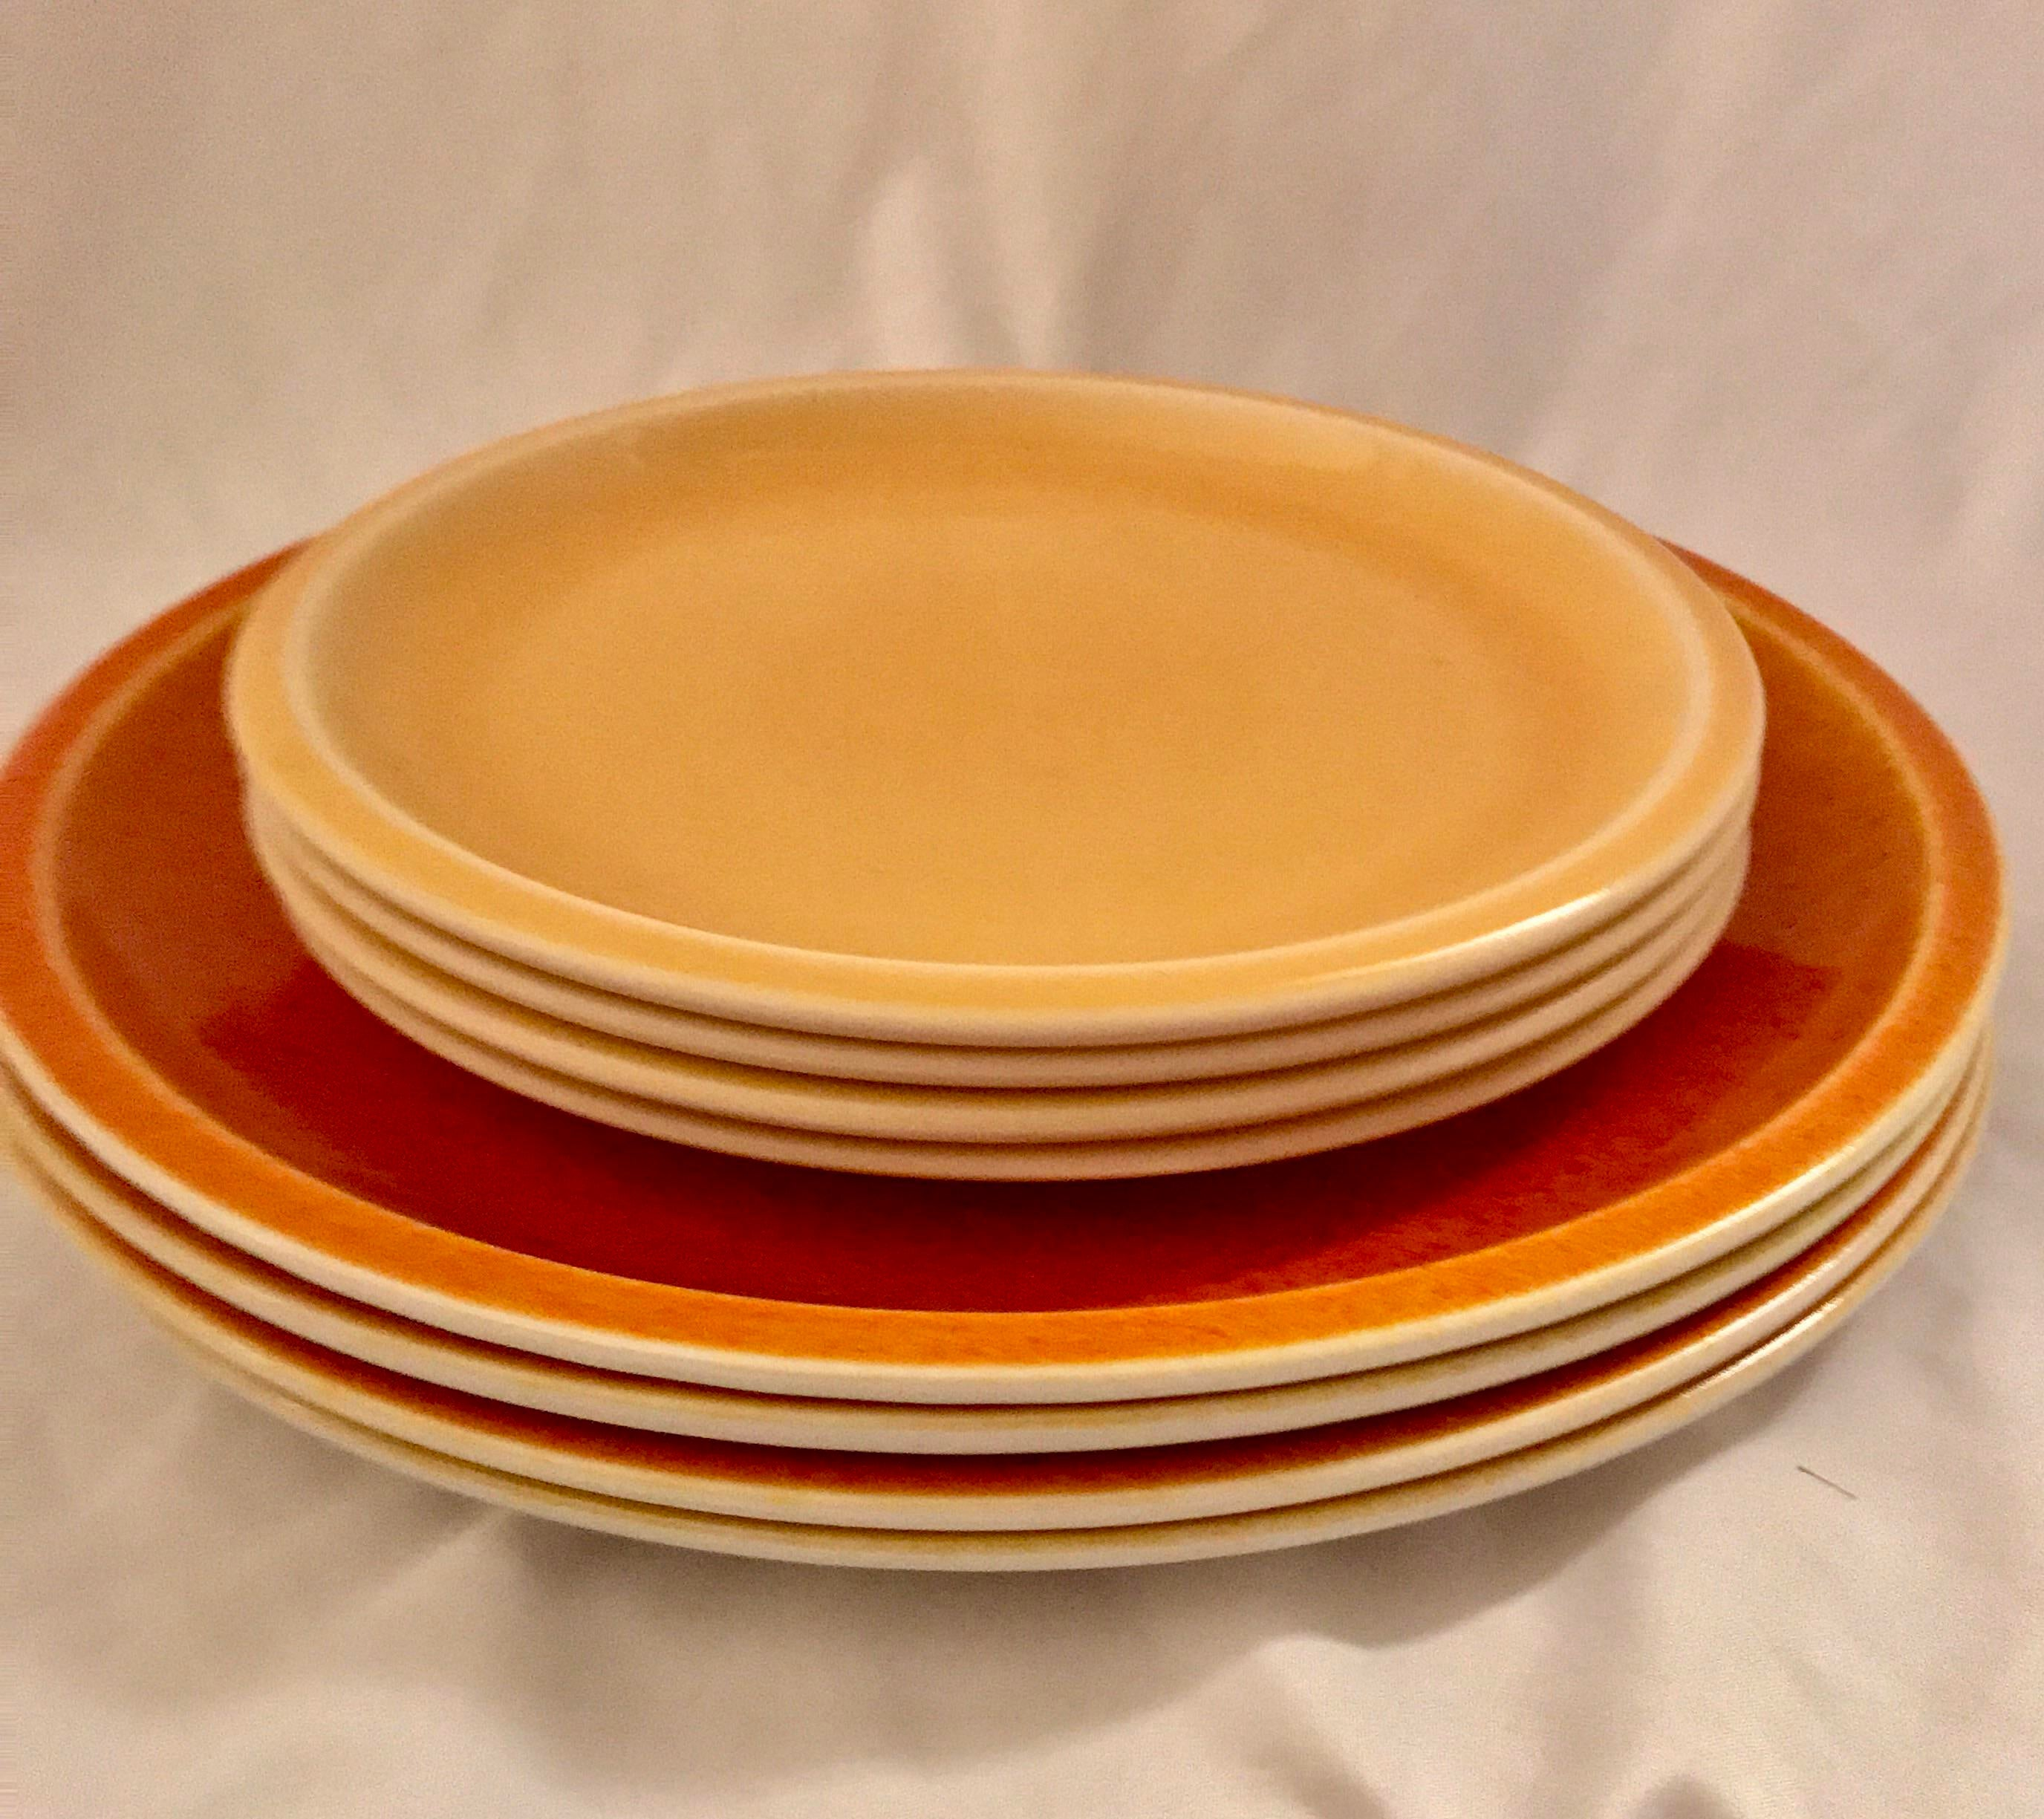 Jars of France Orange Dinner Plates u0026 Yellow Salad Plates - 8 Pieces - Image 3 & Jars of France Orange Dinner Plates u0026 Yellow Salad Plates - 8 Pieces ...